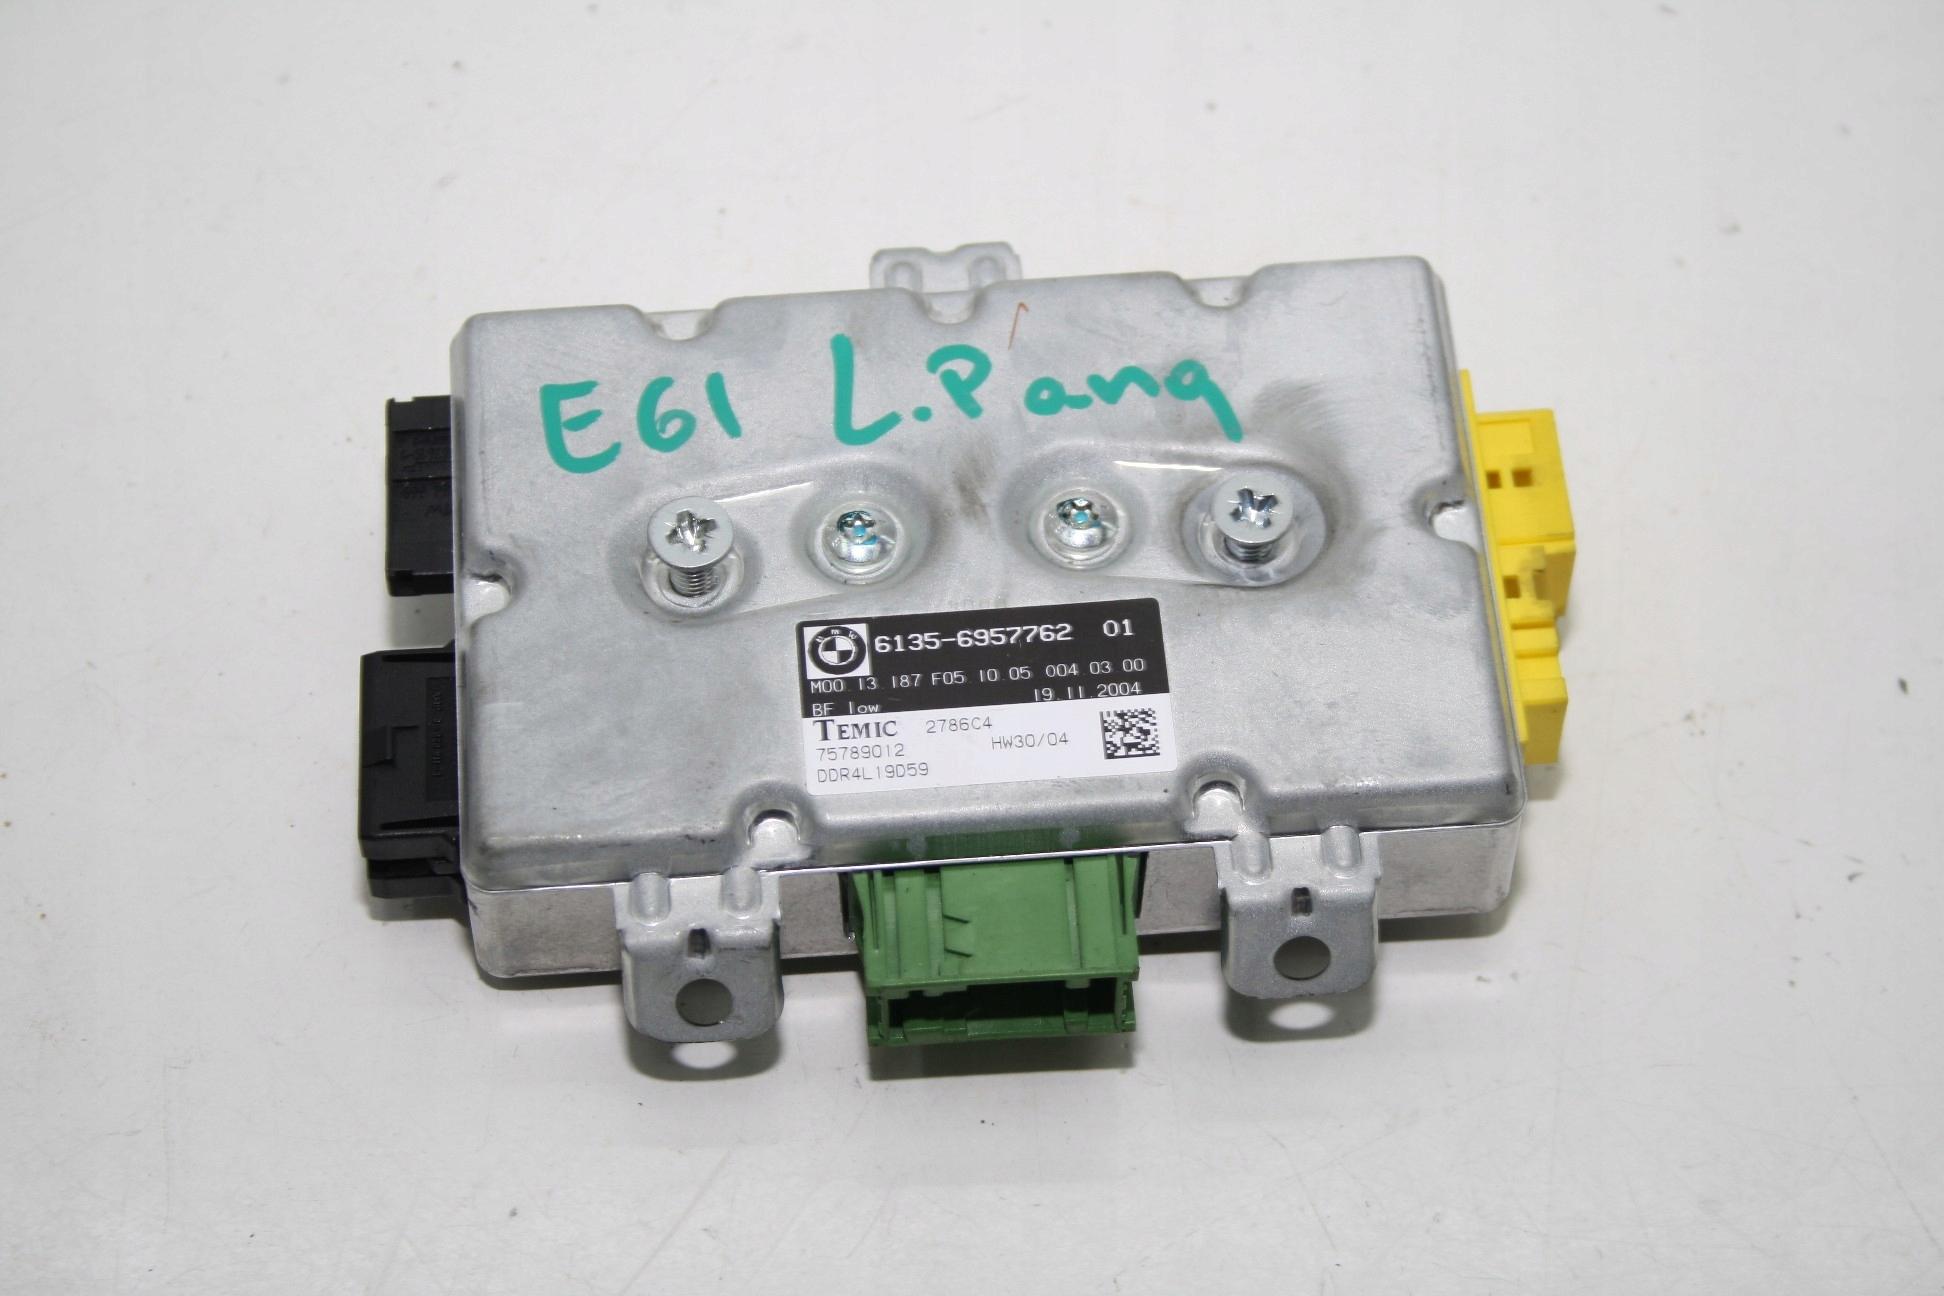 модуль драйвер двери правый вперед bmw e61 6957762